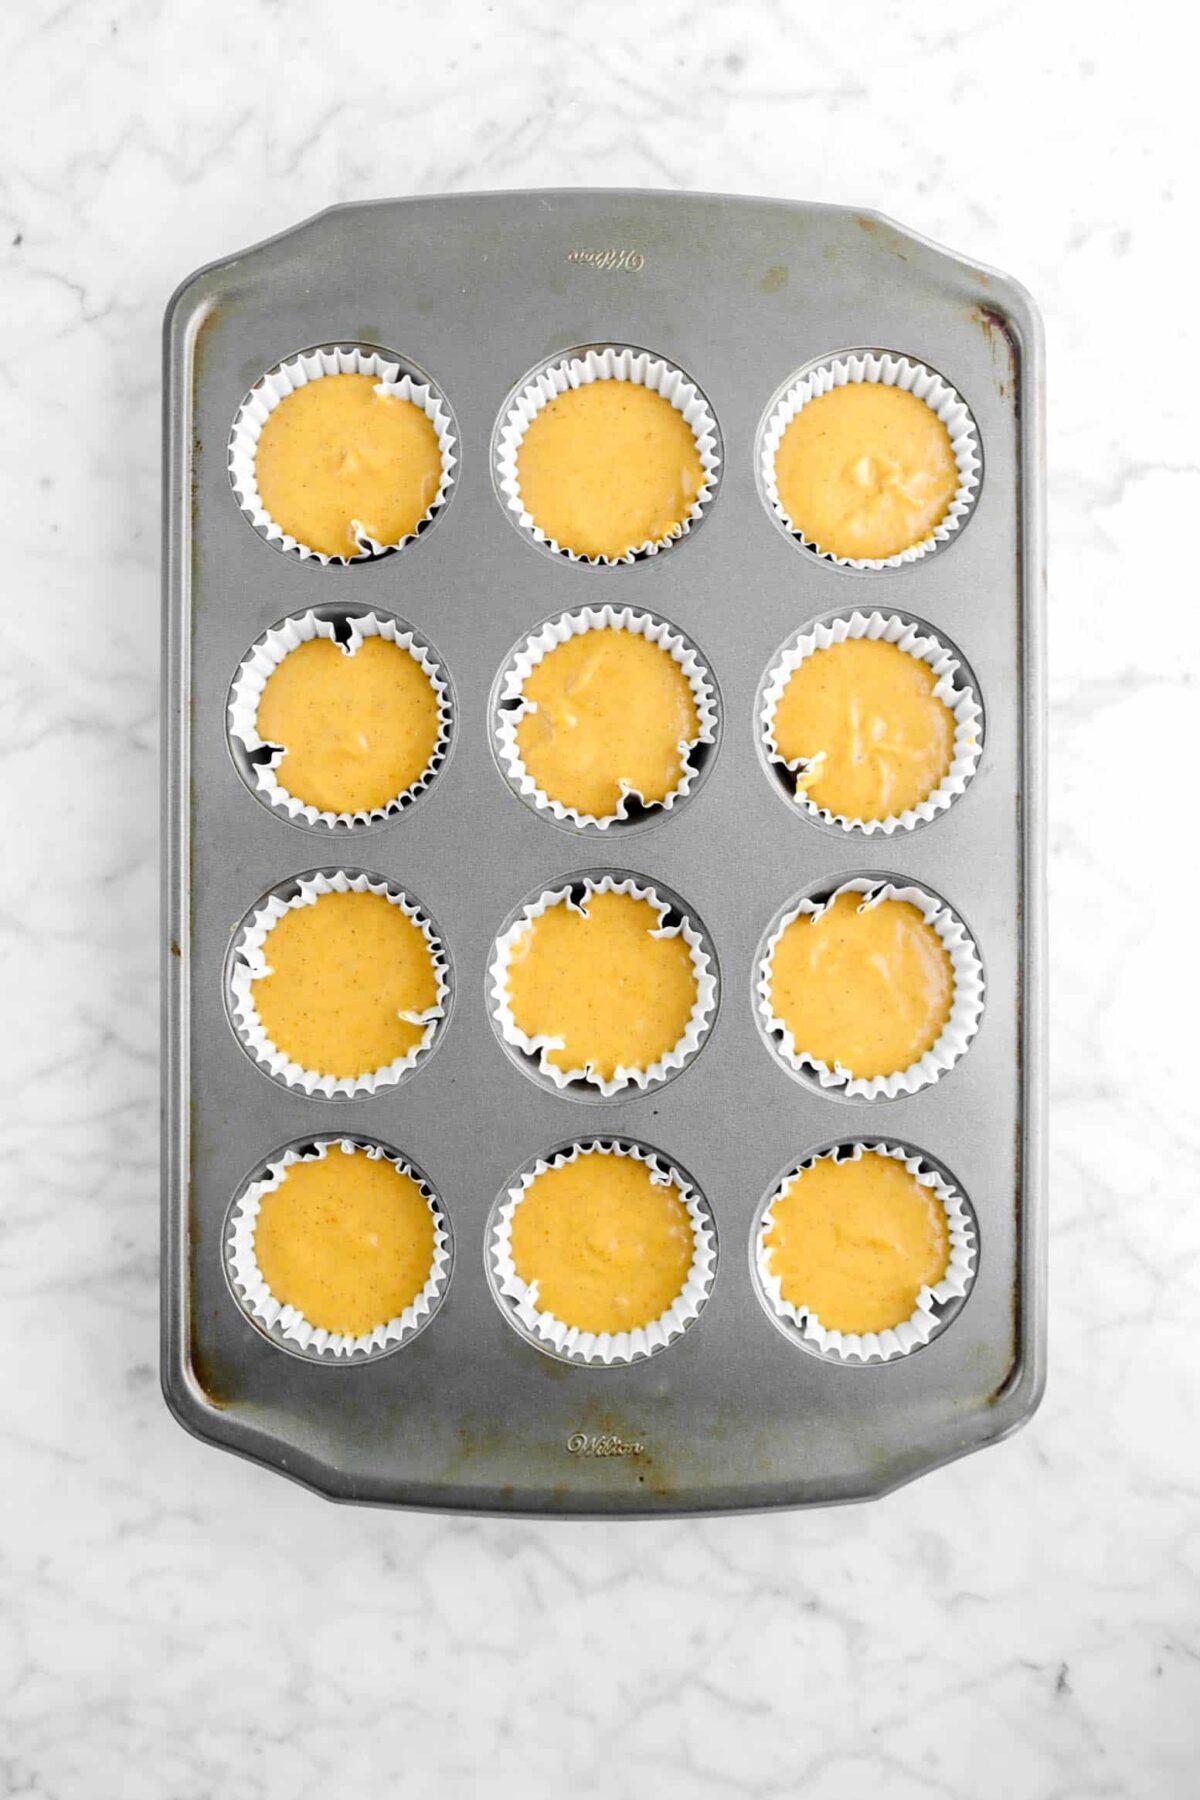 cupcake batter in muffin pan